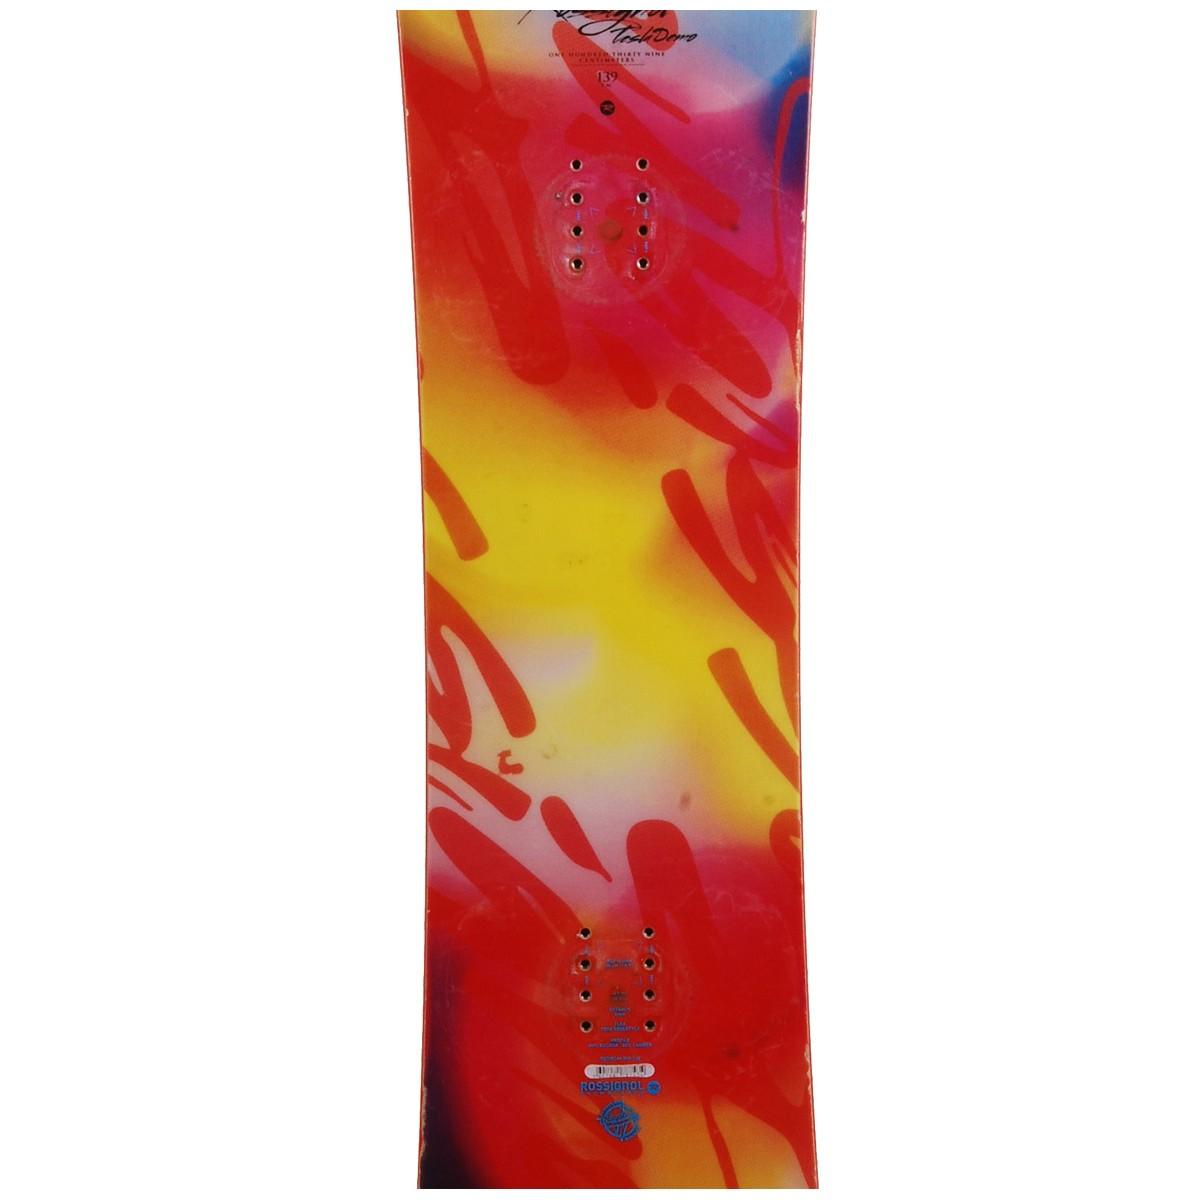 Snowboard-occasion-Rossignol-tesla-demo-fixation-coque miniature 4